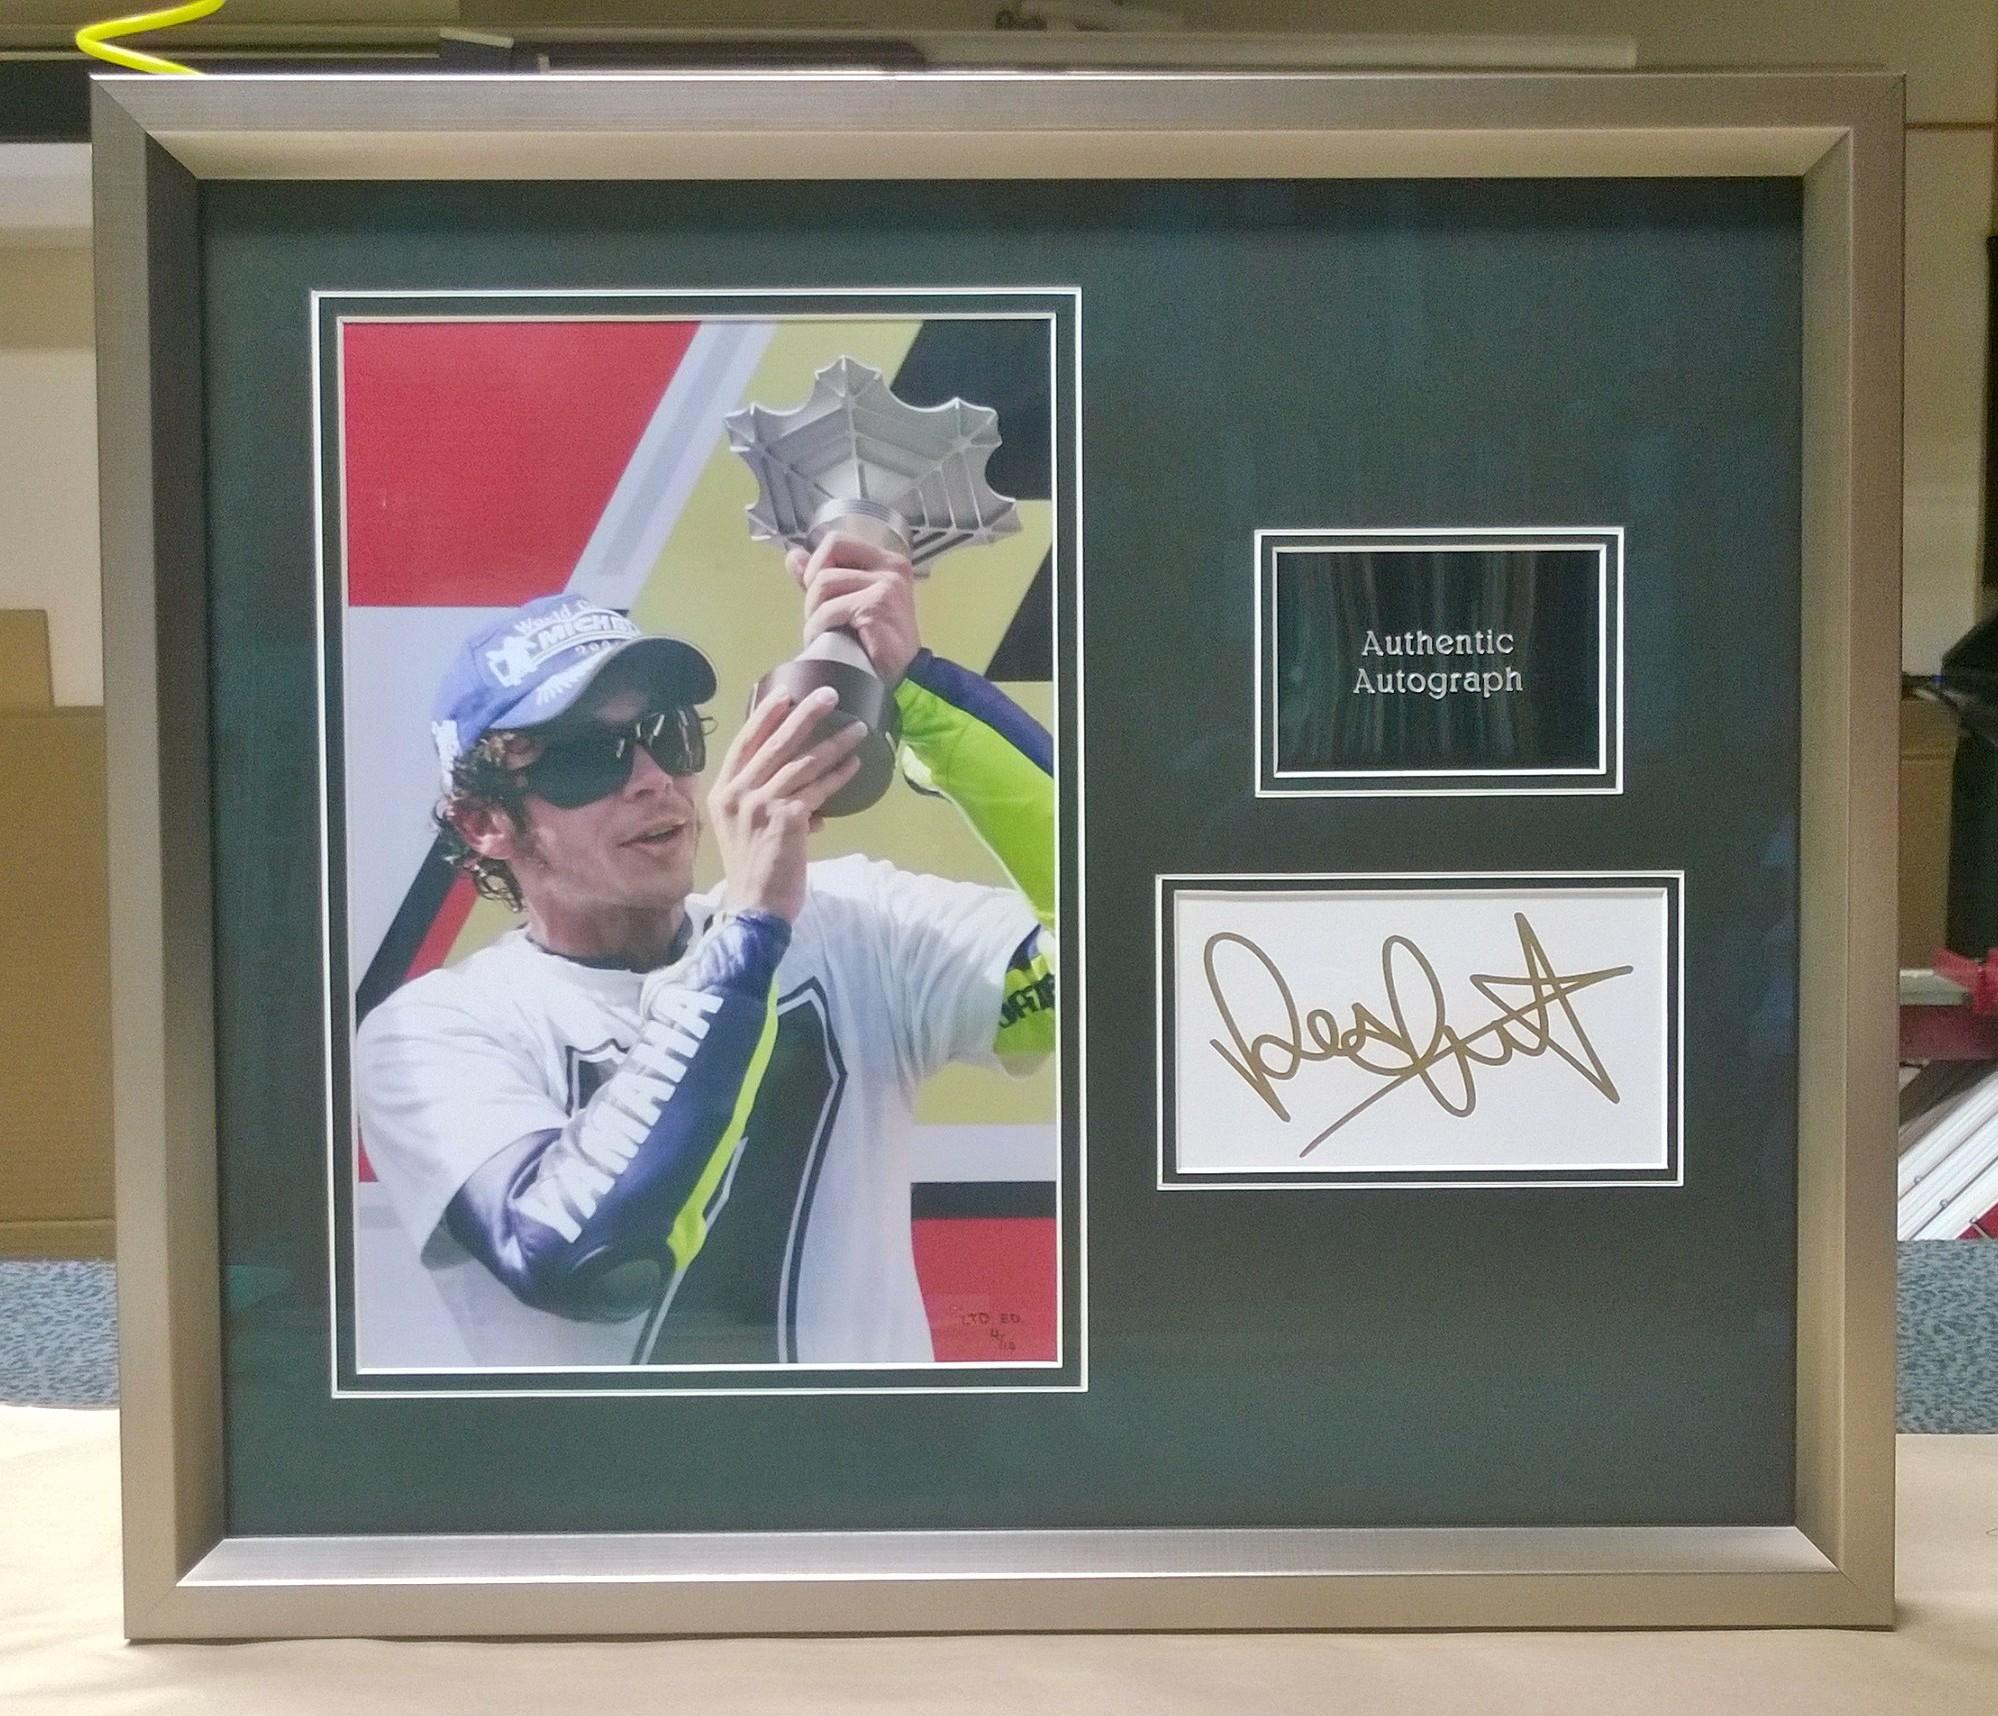 Signed Sporting Memorabilia